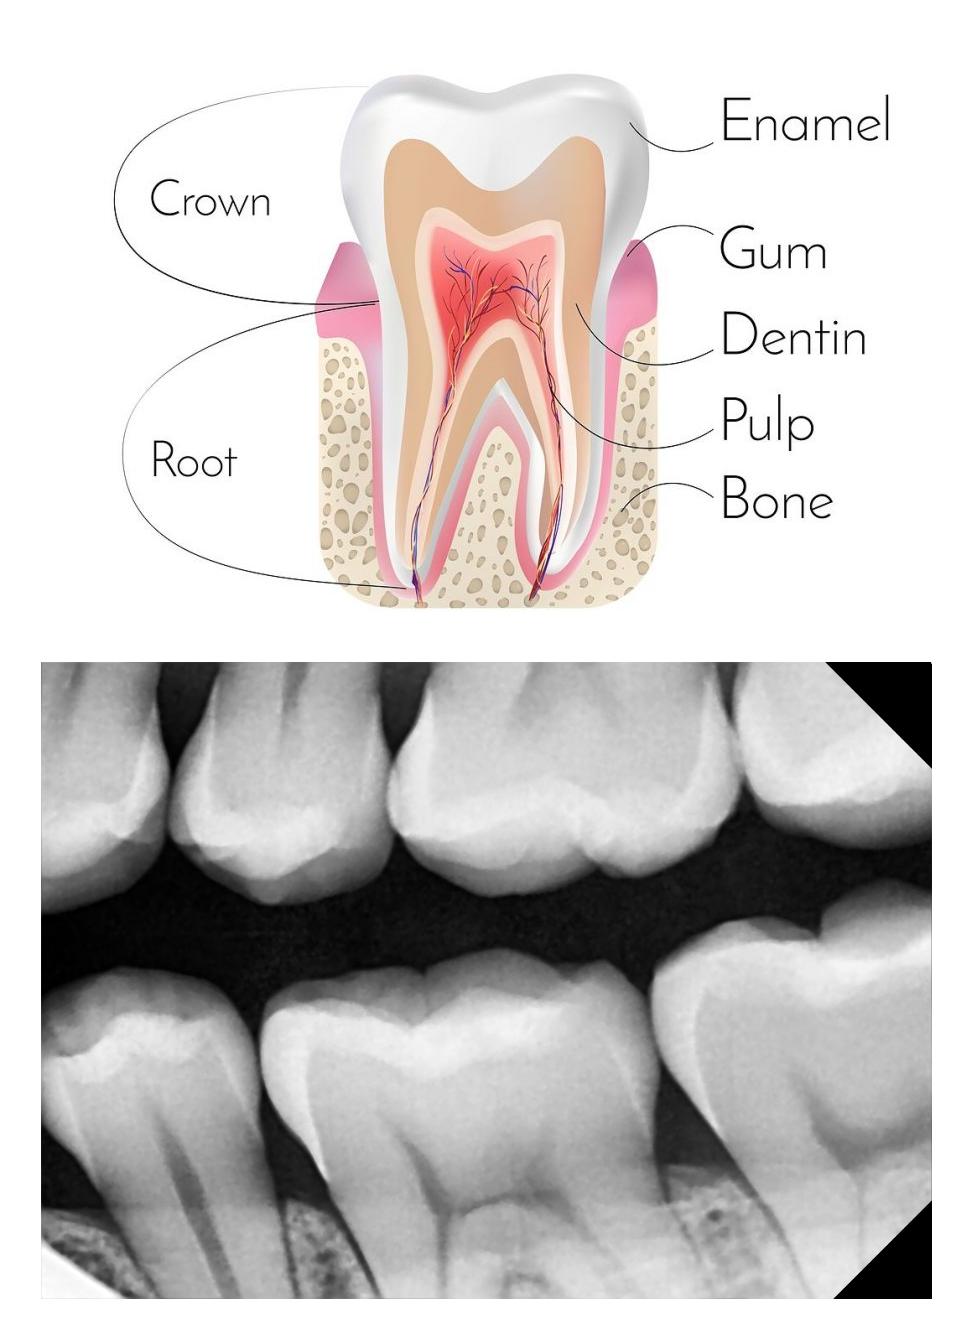 Blacktown Dentist Seven Hills Dentist Dental X-ray Anatomy.png